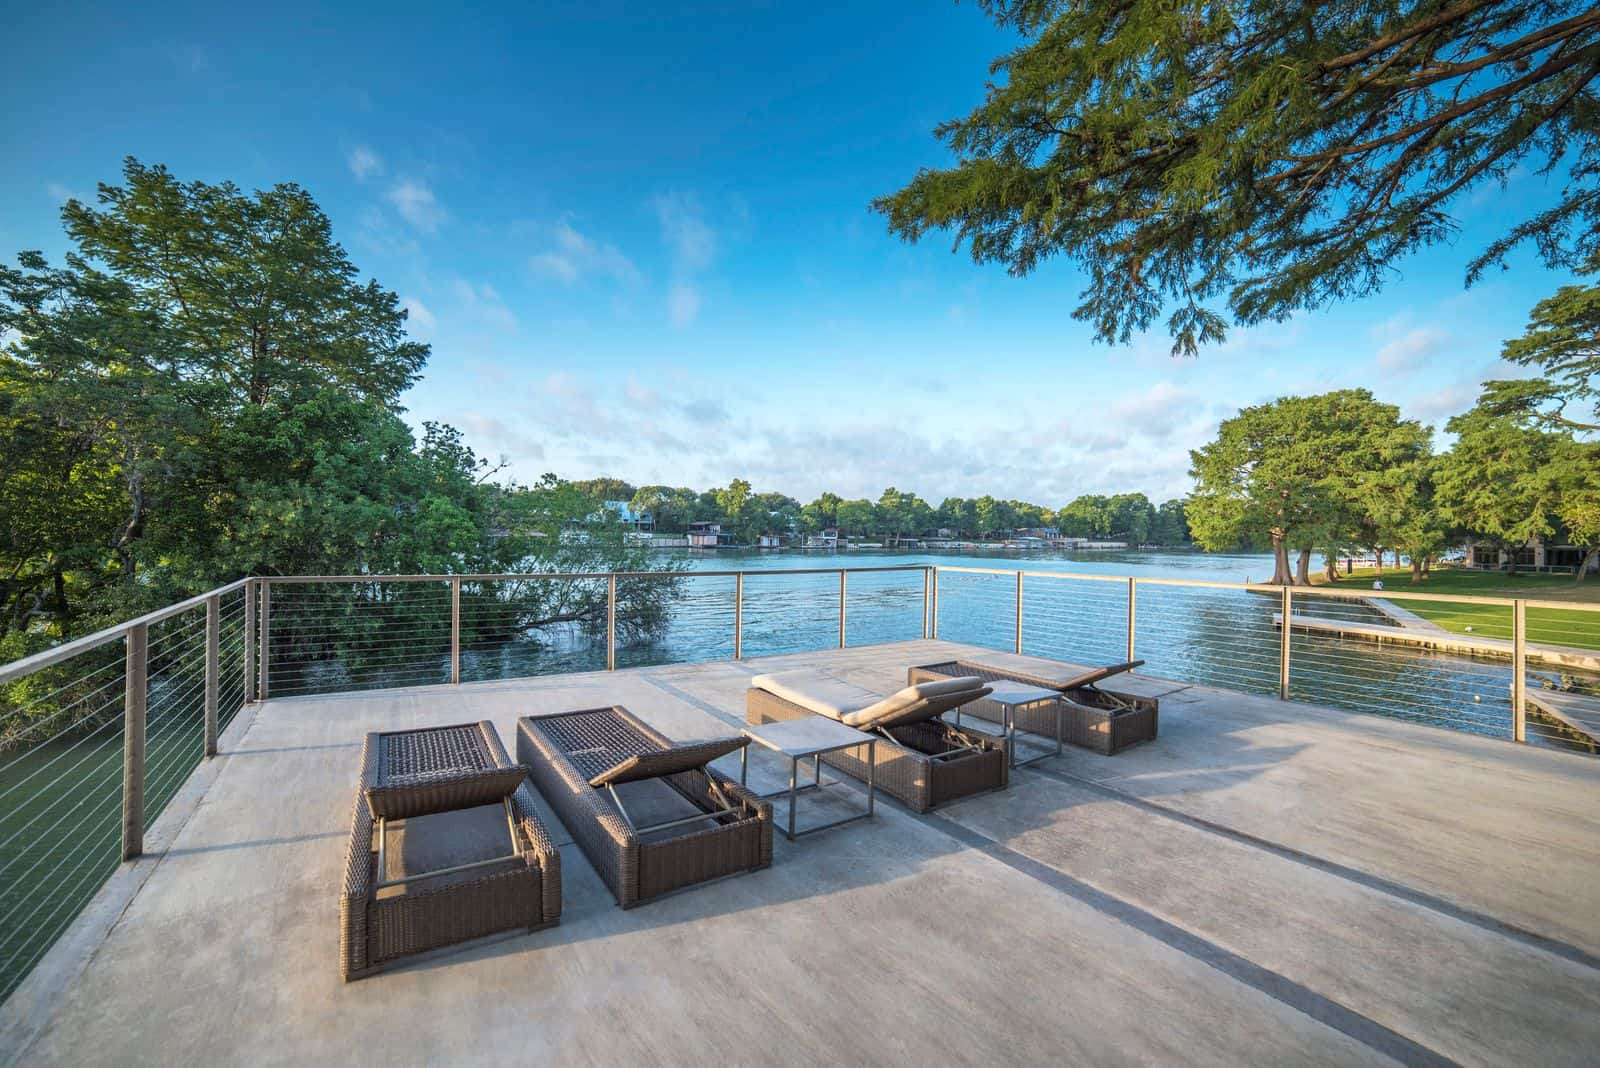 Lake McQueeney Pool Deck